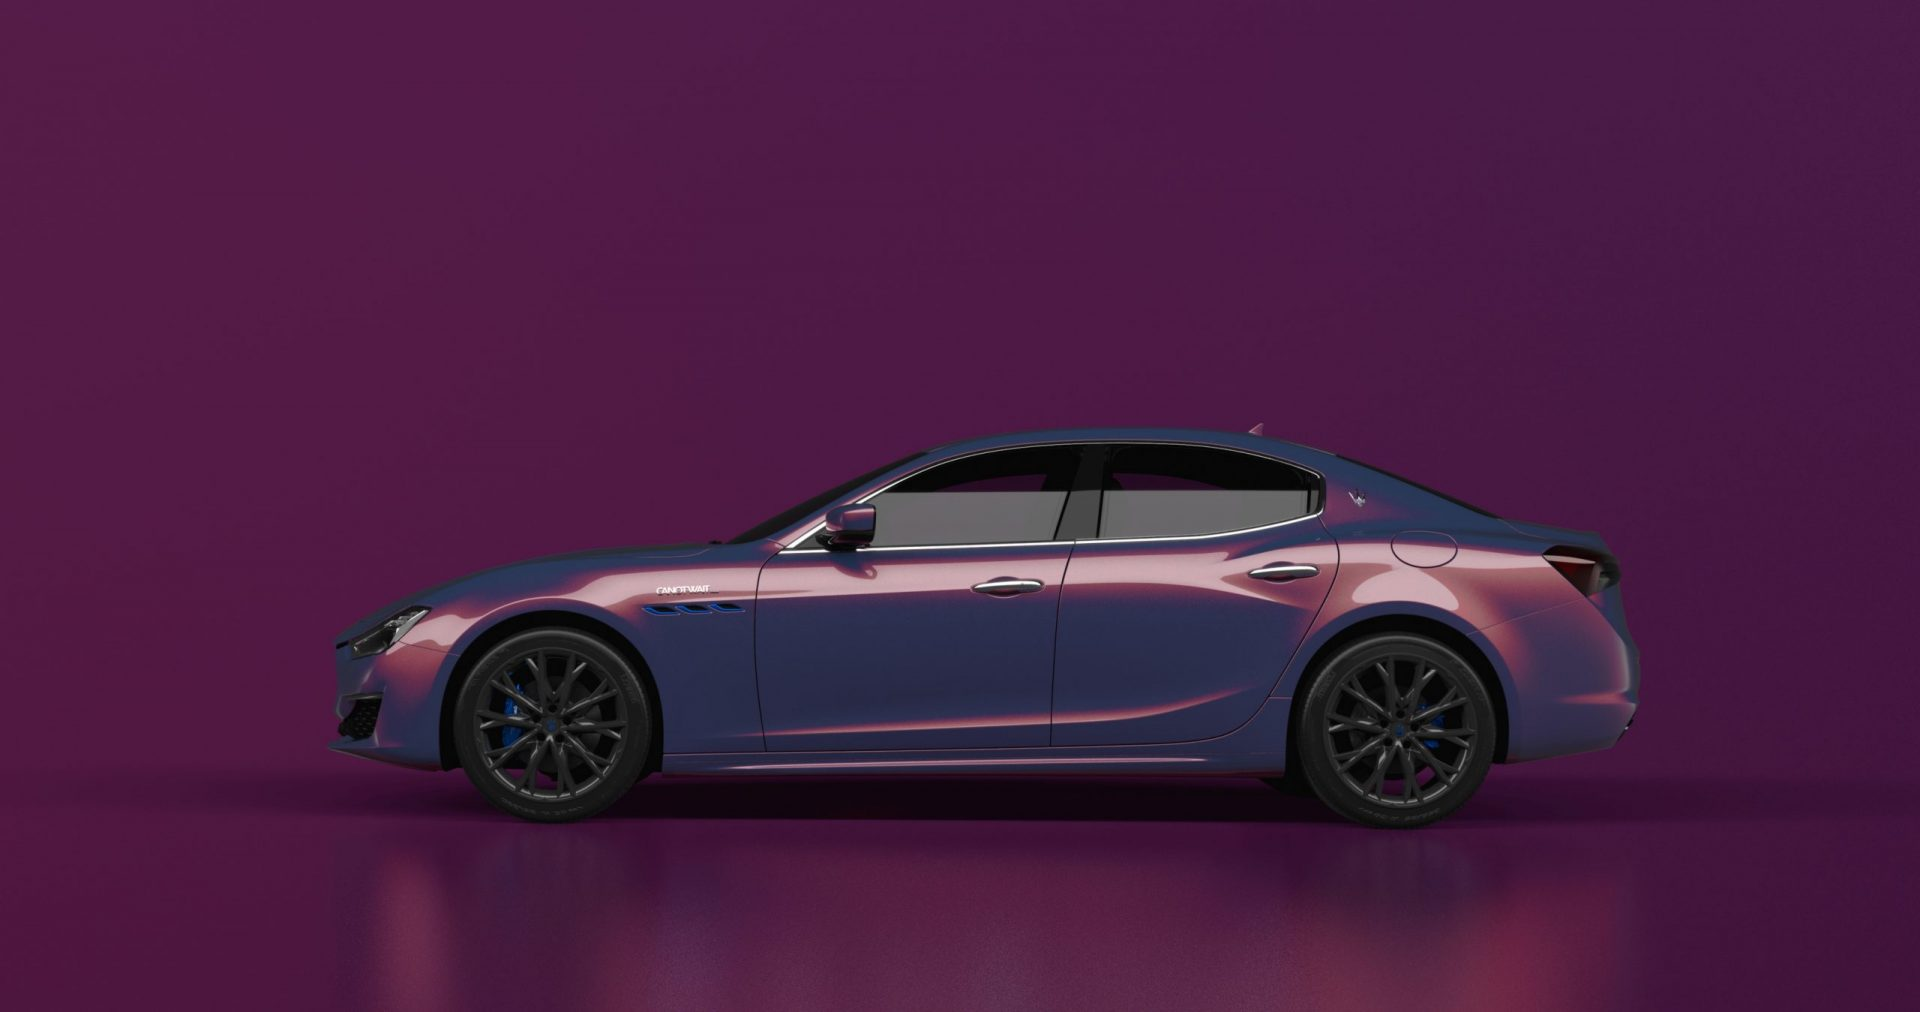 Maserati Ghibli Hybrid Love Audacius